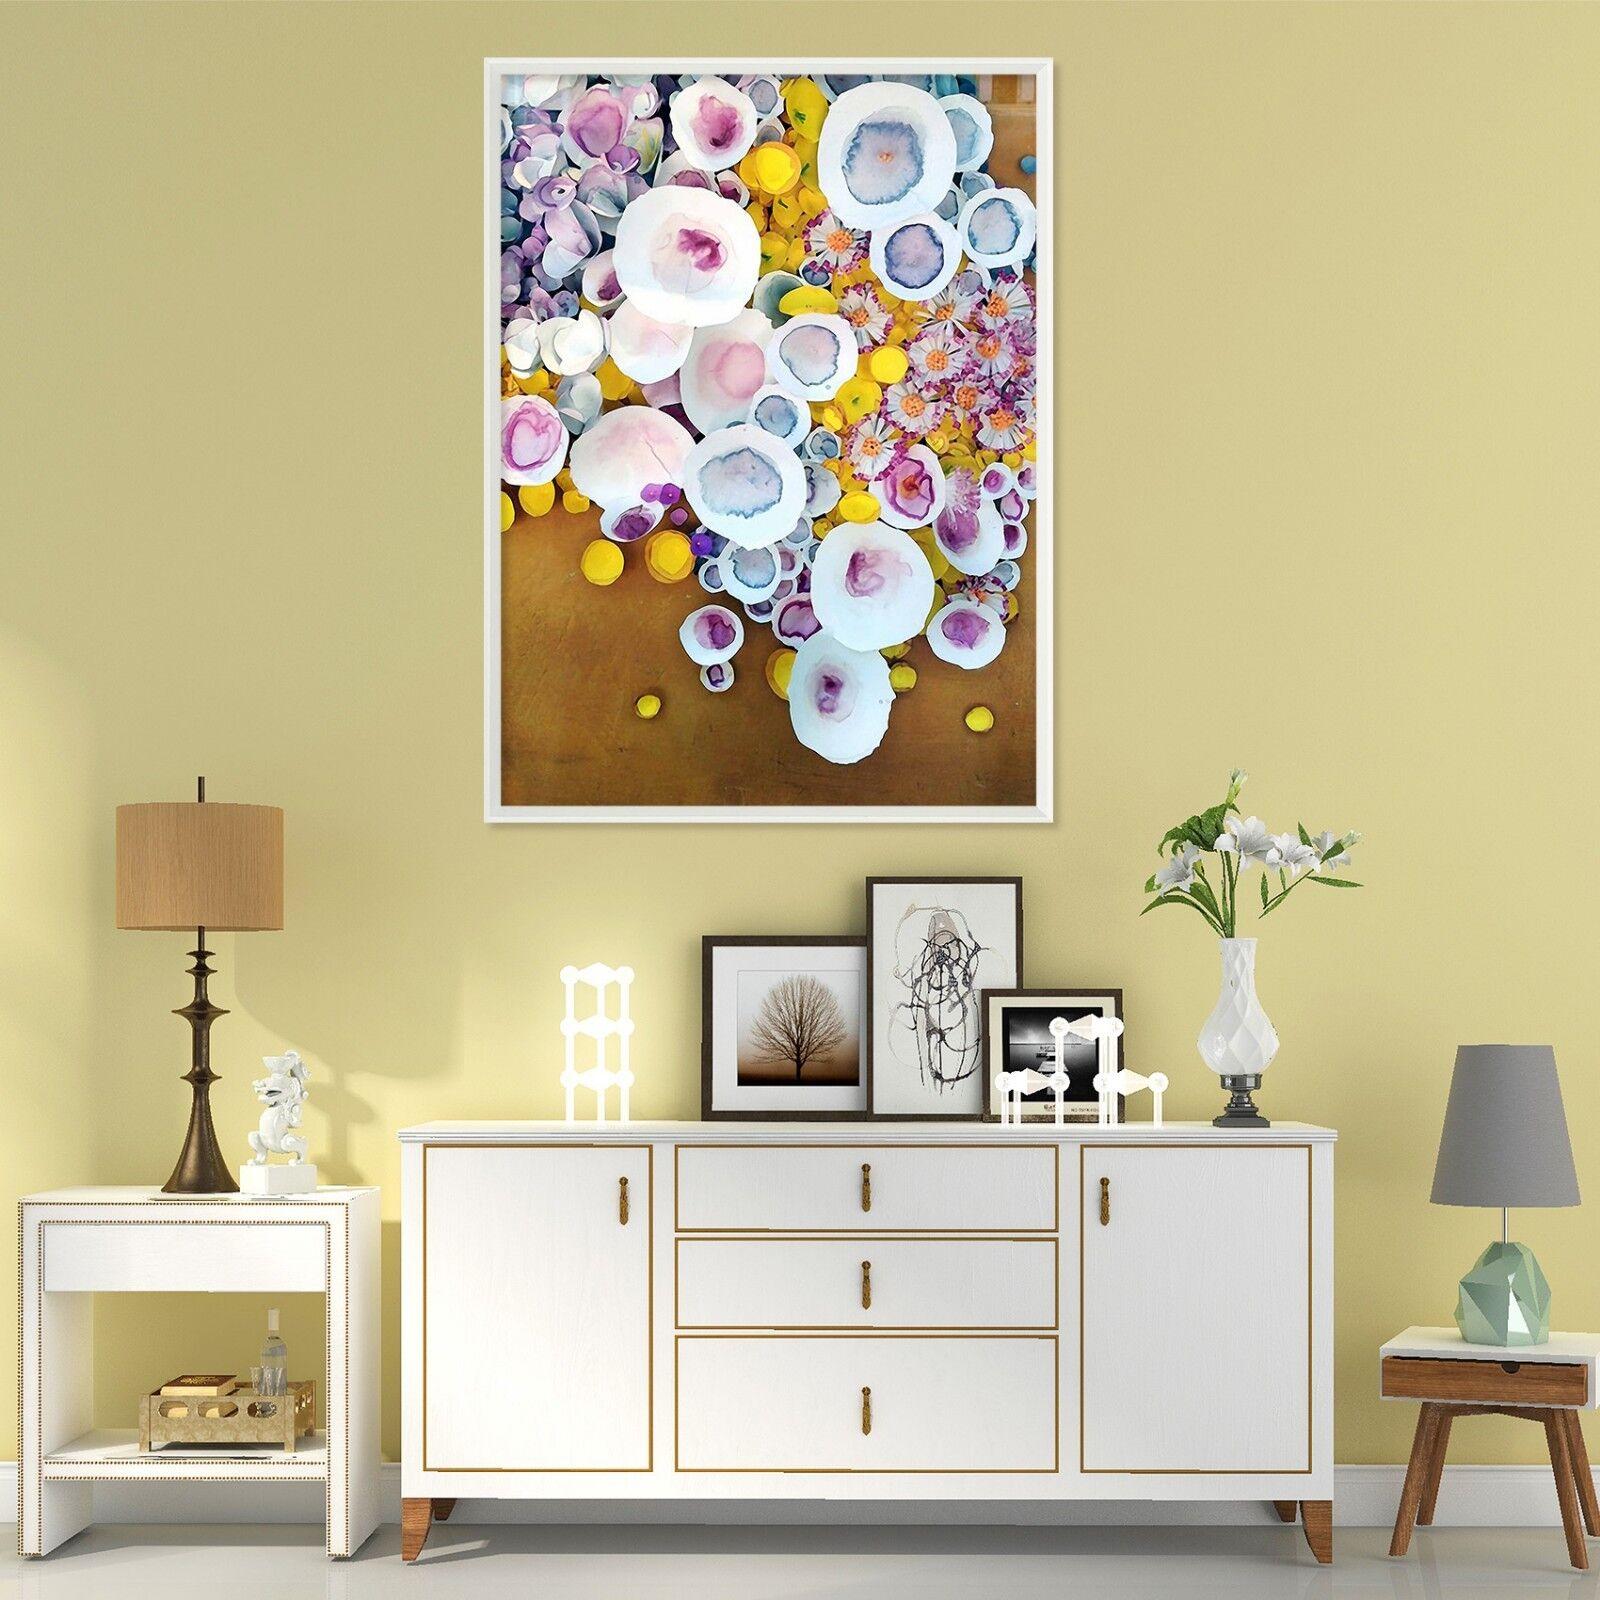 3D Floral Graffiti 3 Framed Poster Home Decor Print Painting Art AJ WALLPAPER